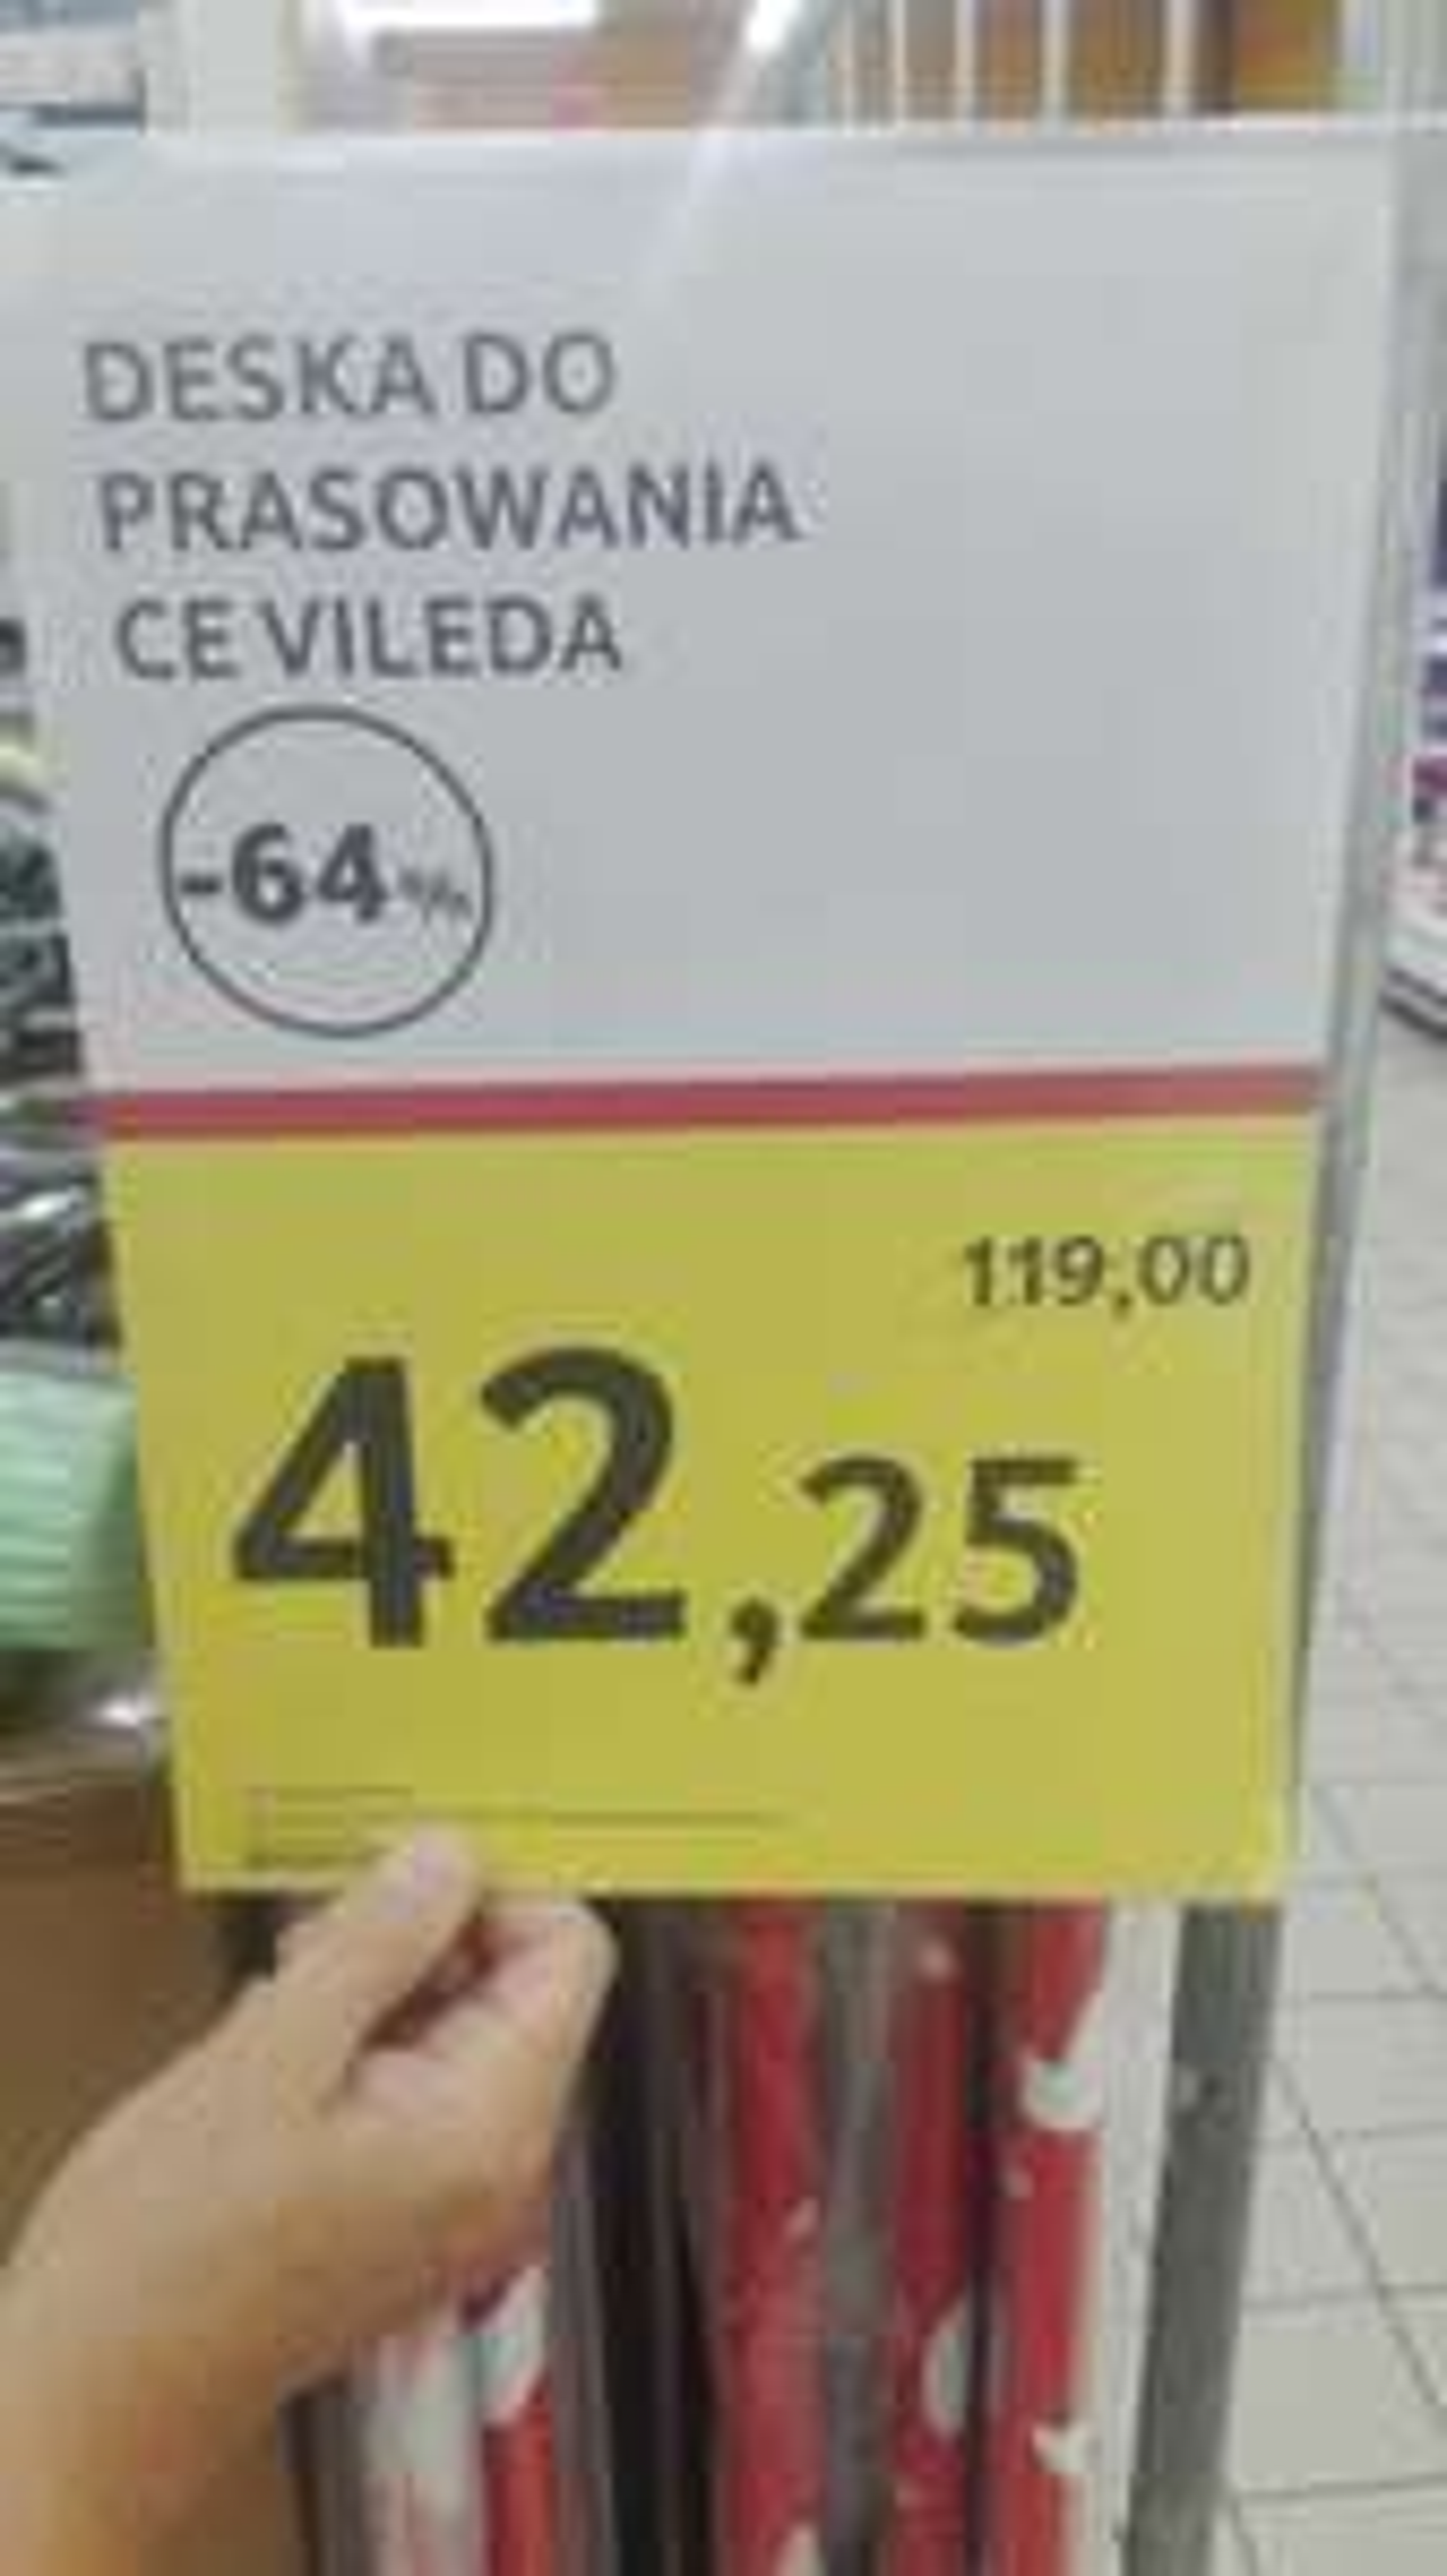 DESKA DO PRASOWANIA VILEDA 42,25zł !!! -64%/ TESCO